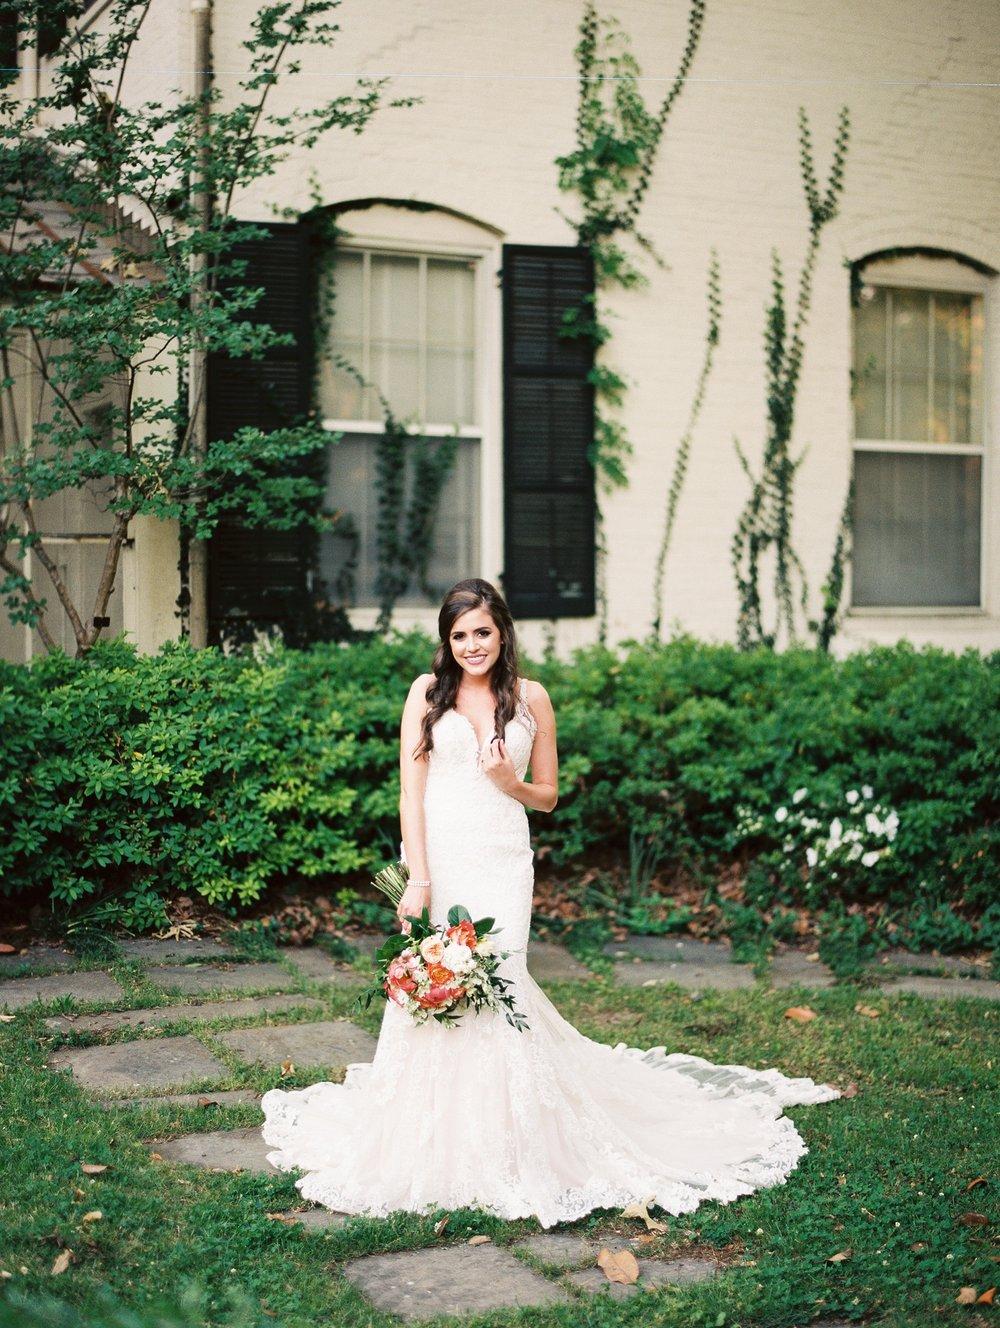 The-Terry-House-Wedding-Little-Rock-Arkansas_0072.jpg